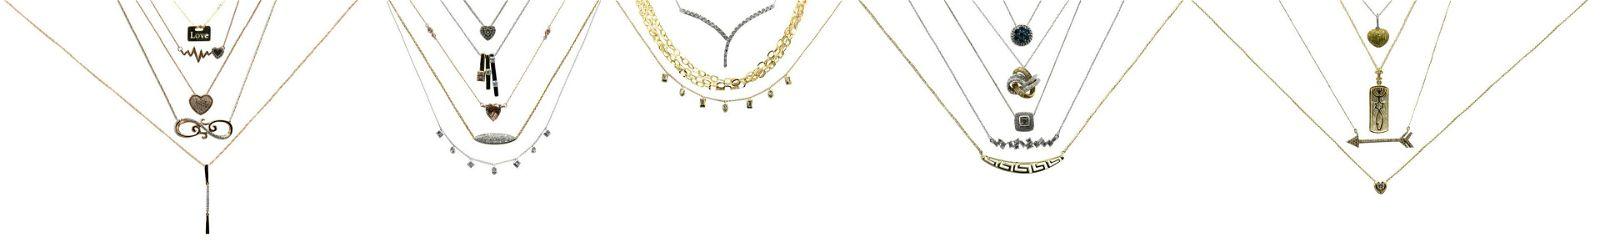 Group of 10 Karat Gold Necklaces